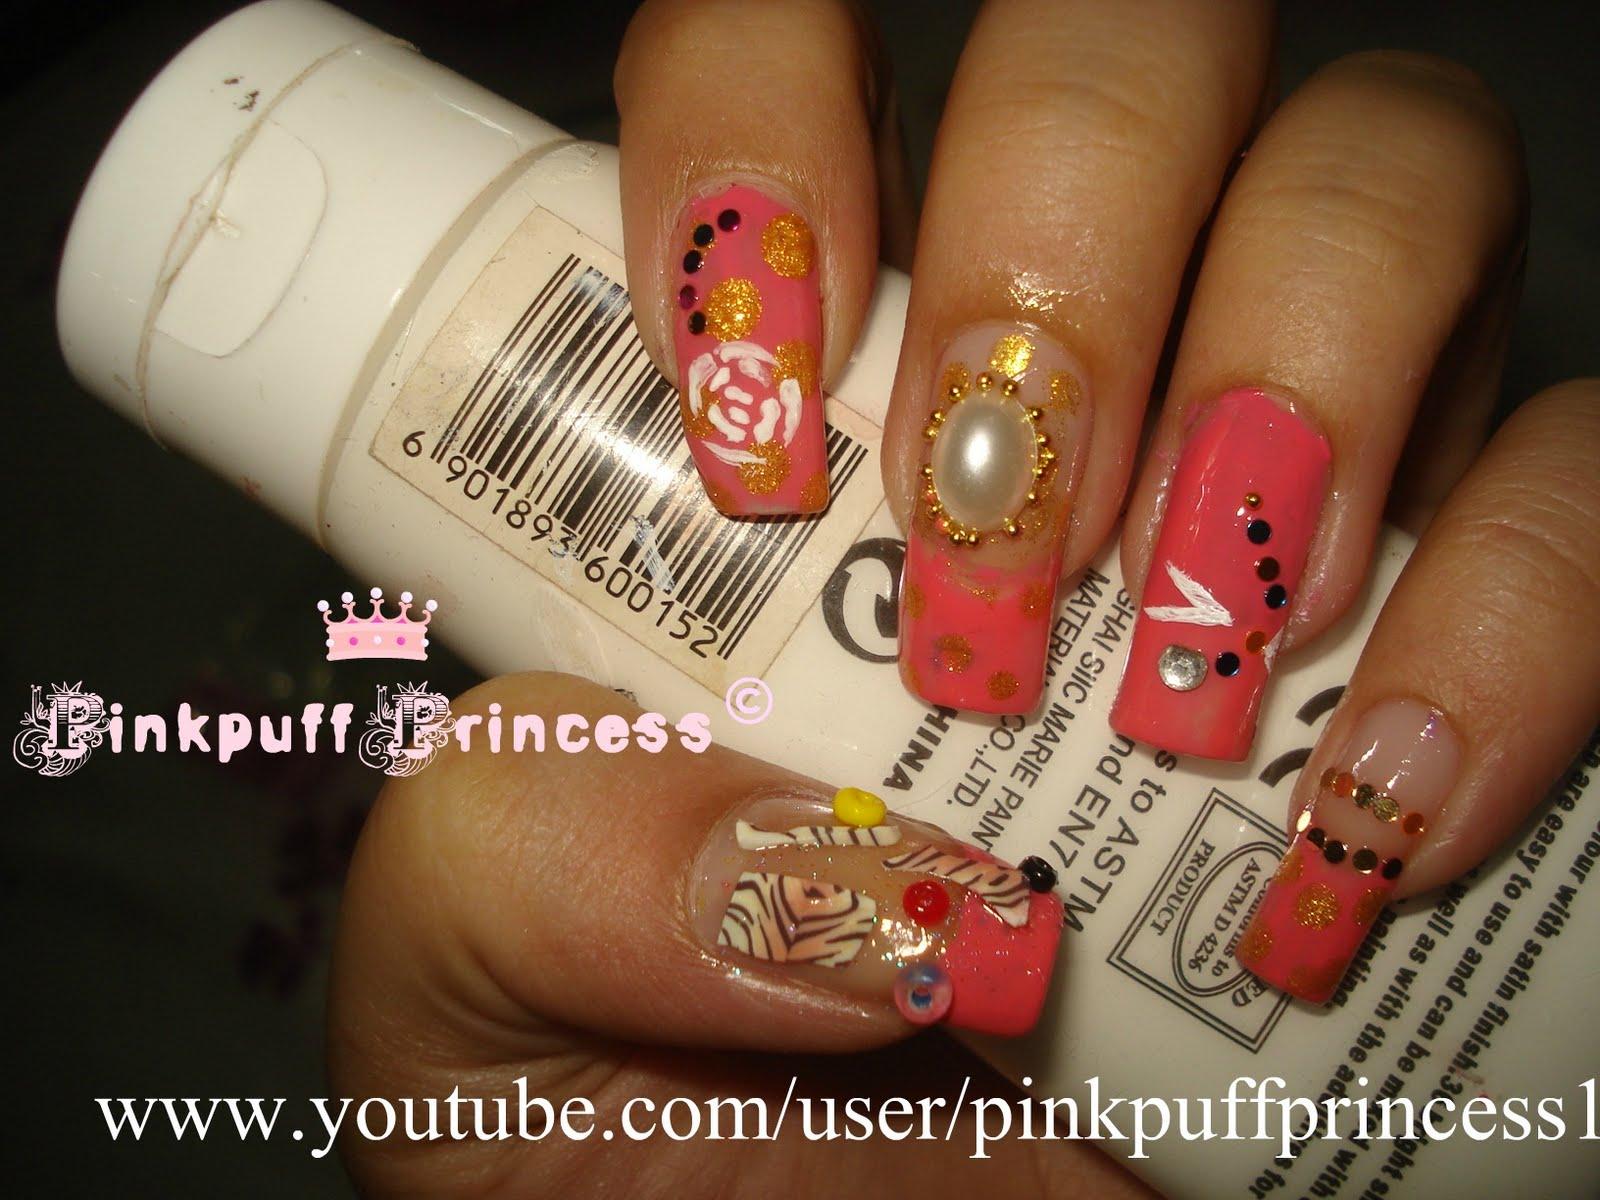 Pinkpuff Prince$$ Blog: Nail Art Tutorial Playlist